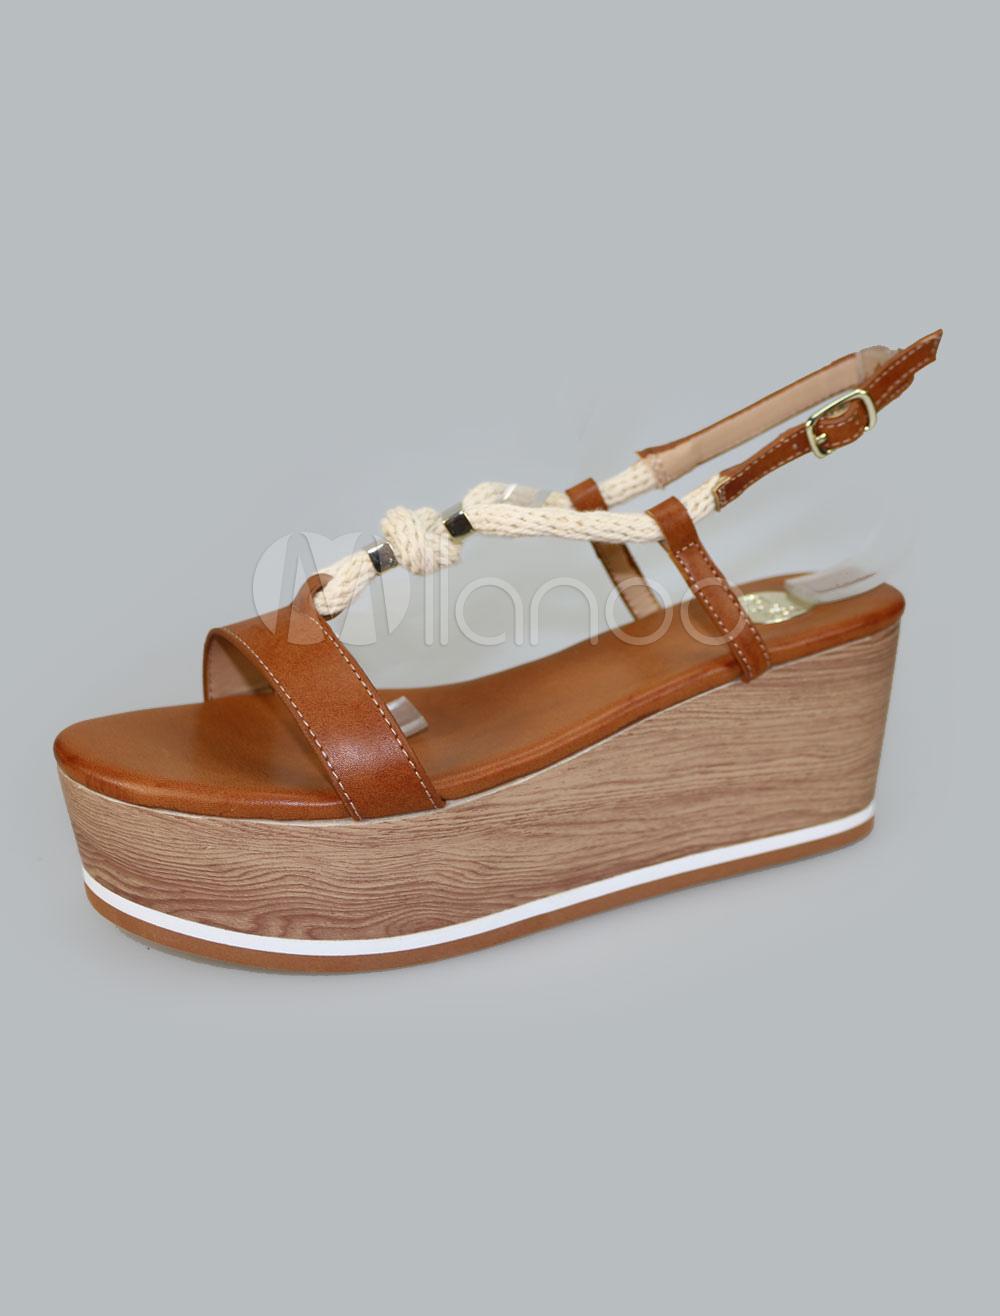 Women Summer Sandals Strappy Color Block Flatform Women Lace Up Wedge Sandal